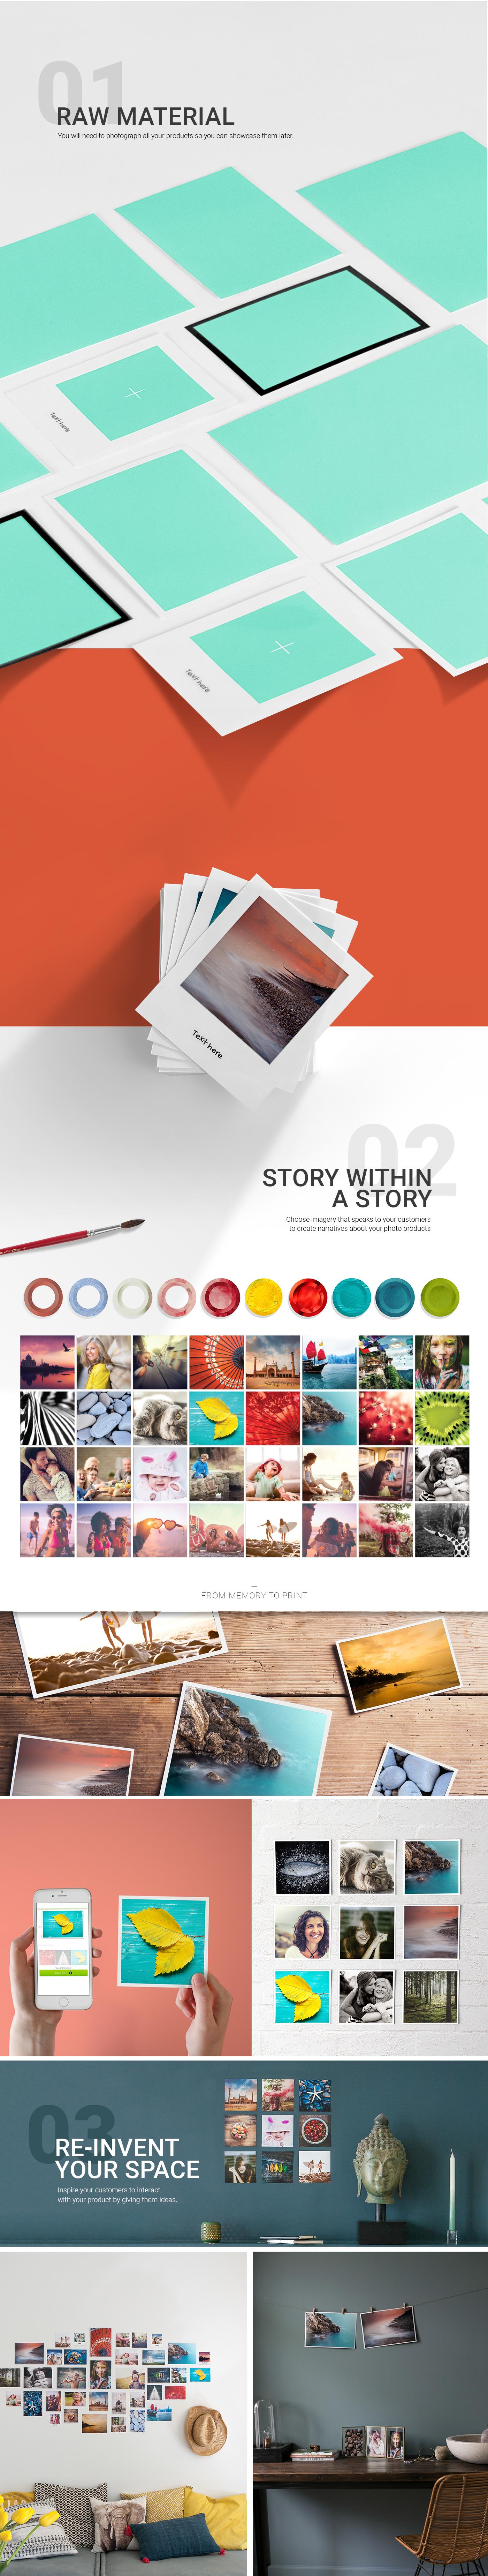 branding  Photography  moodboards marketing   Stratagy Story telling art direction